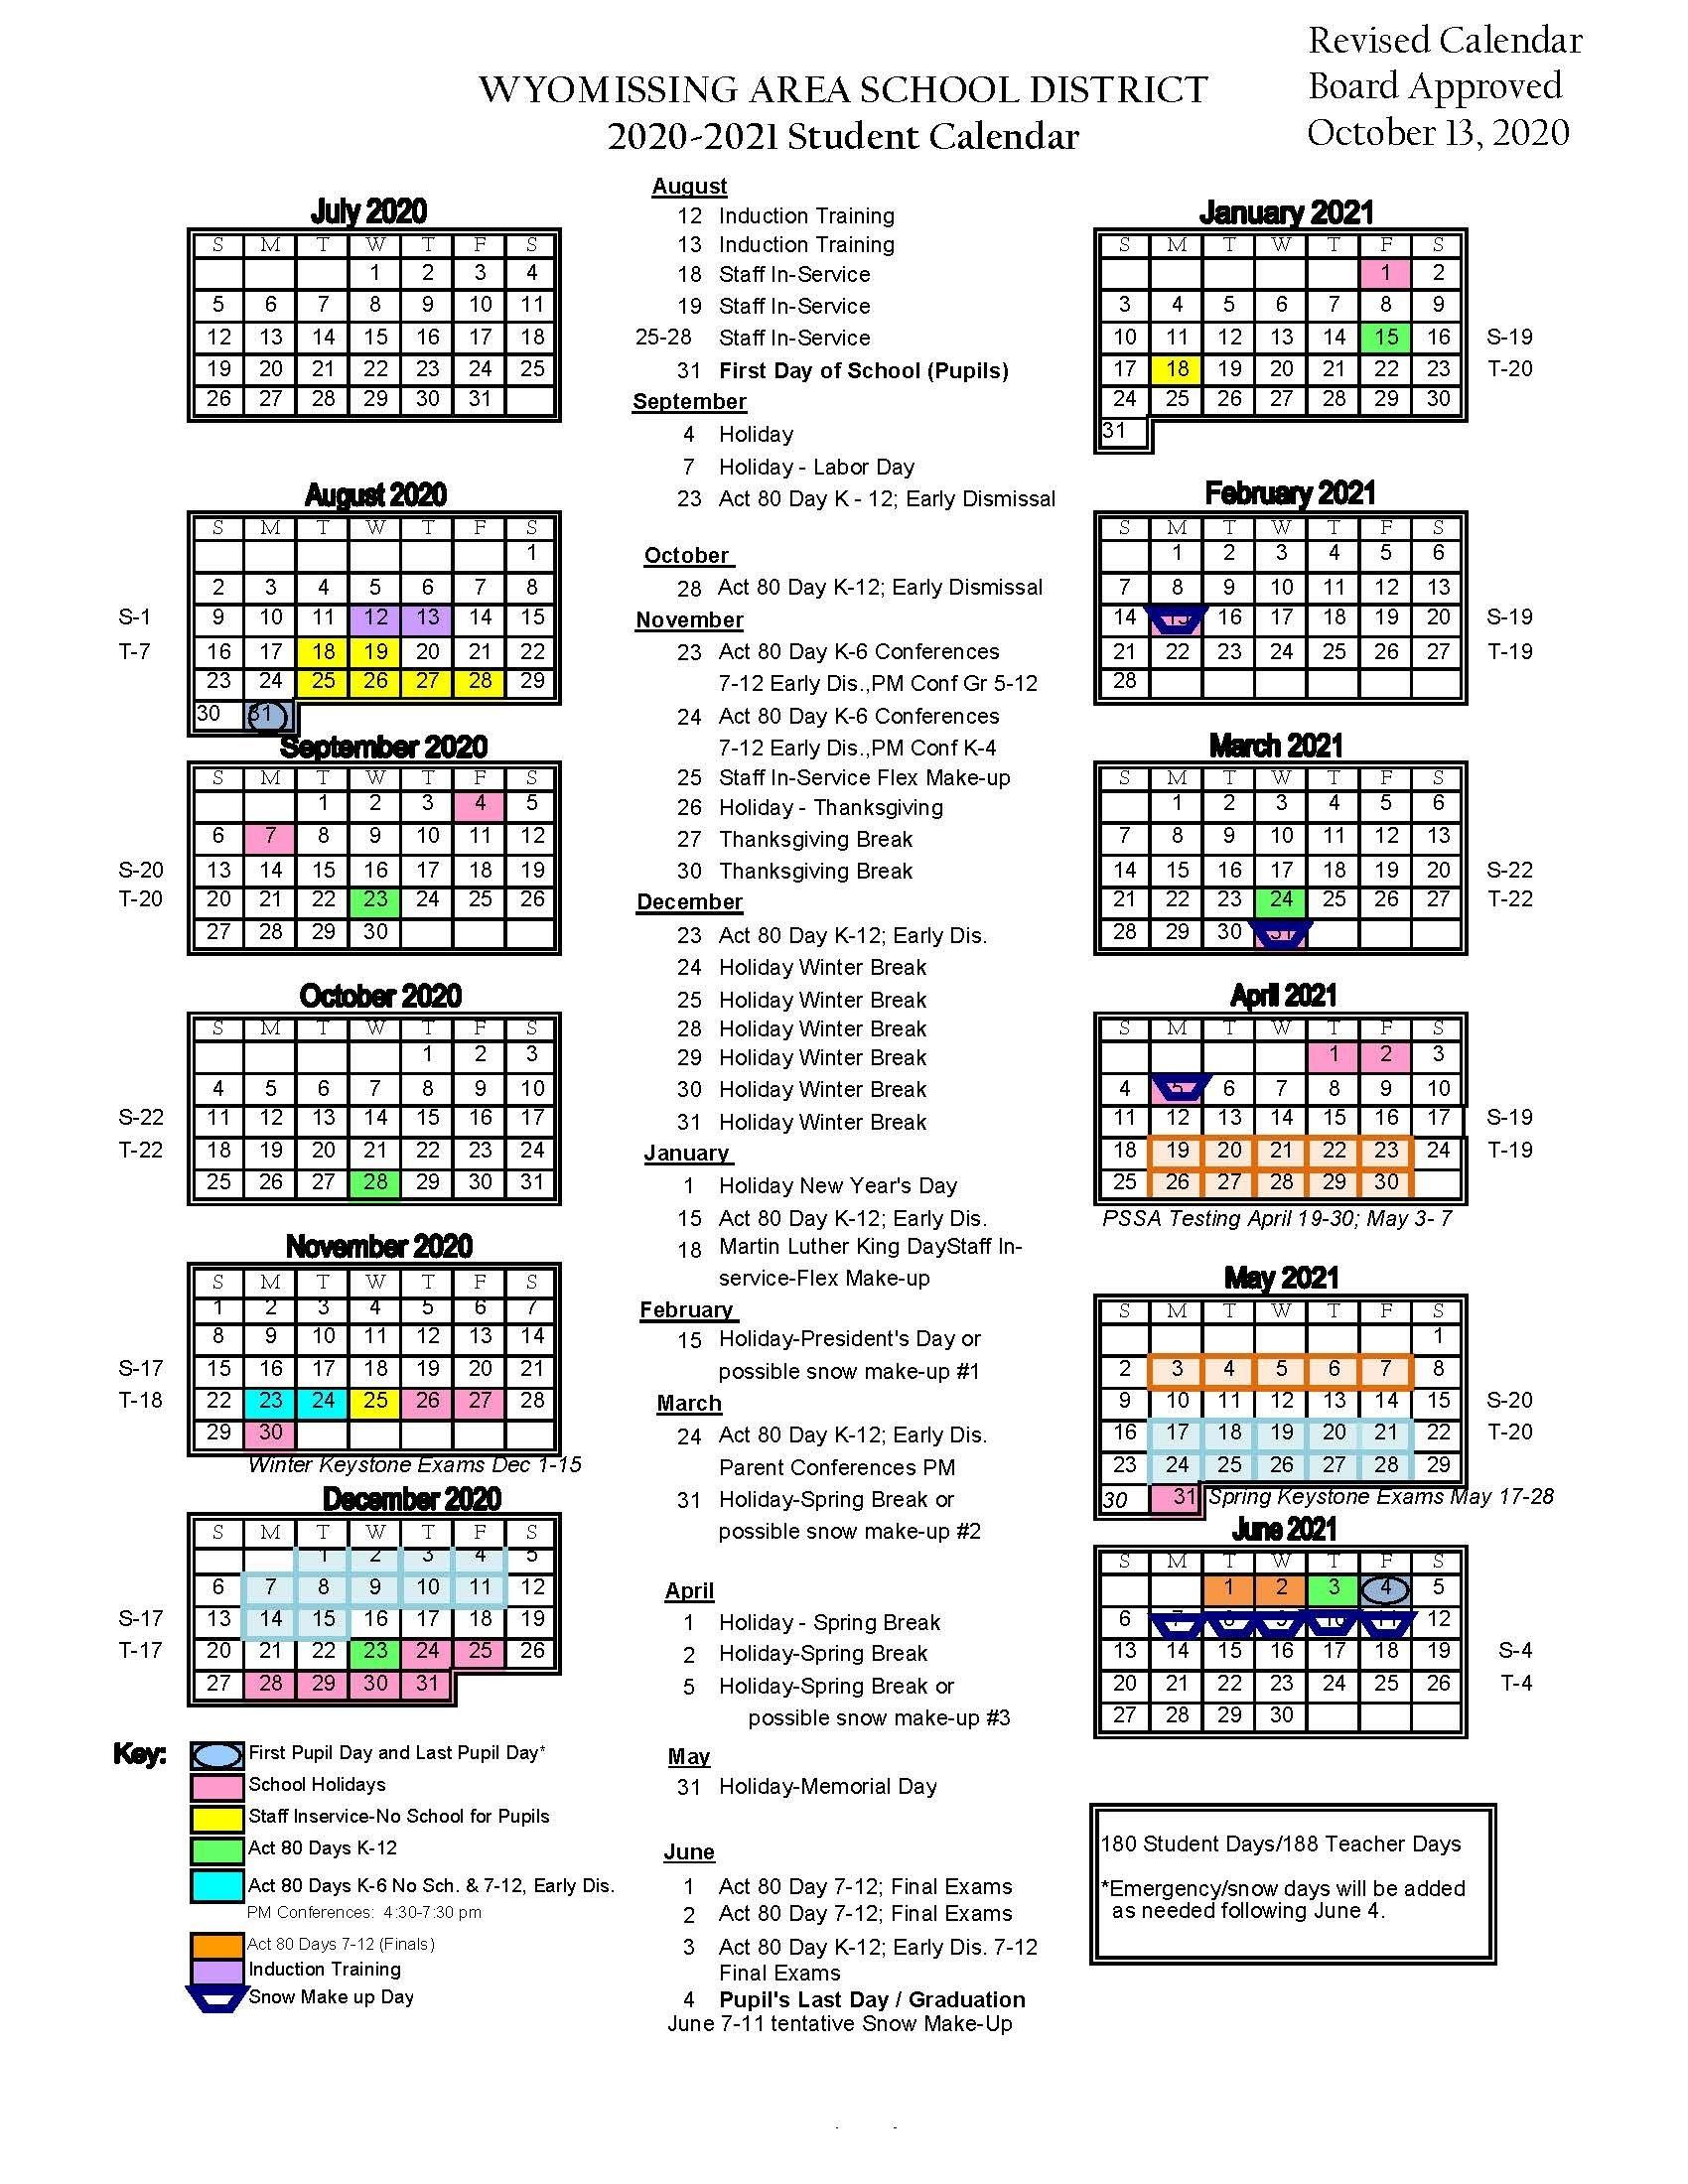 2020-2021 District Calendar - Wyomissing Area School District